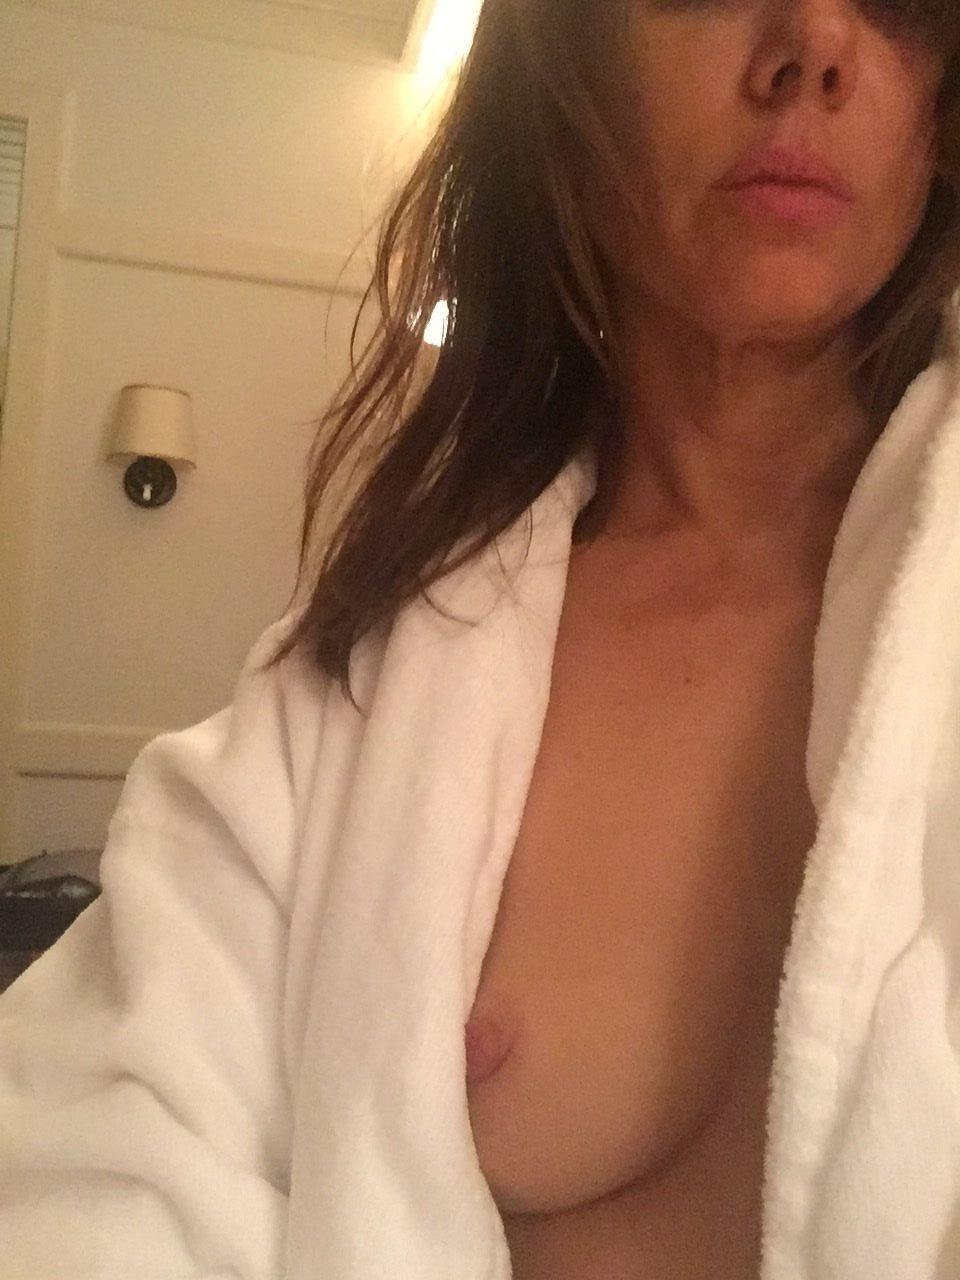 natasha-leggero-nude-naked-sexwomen-movies